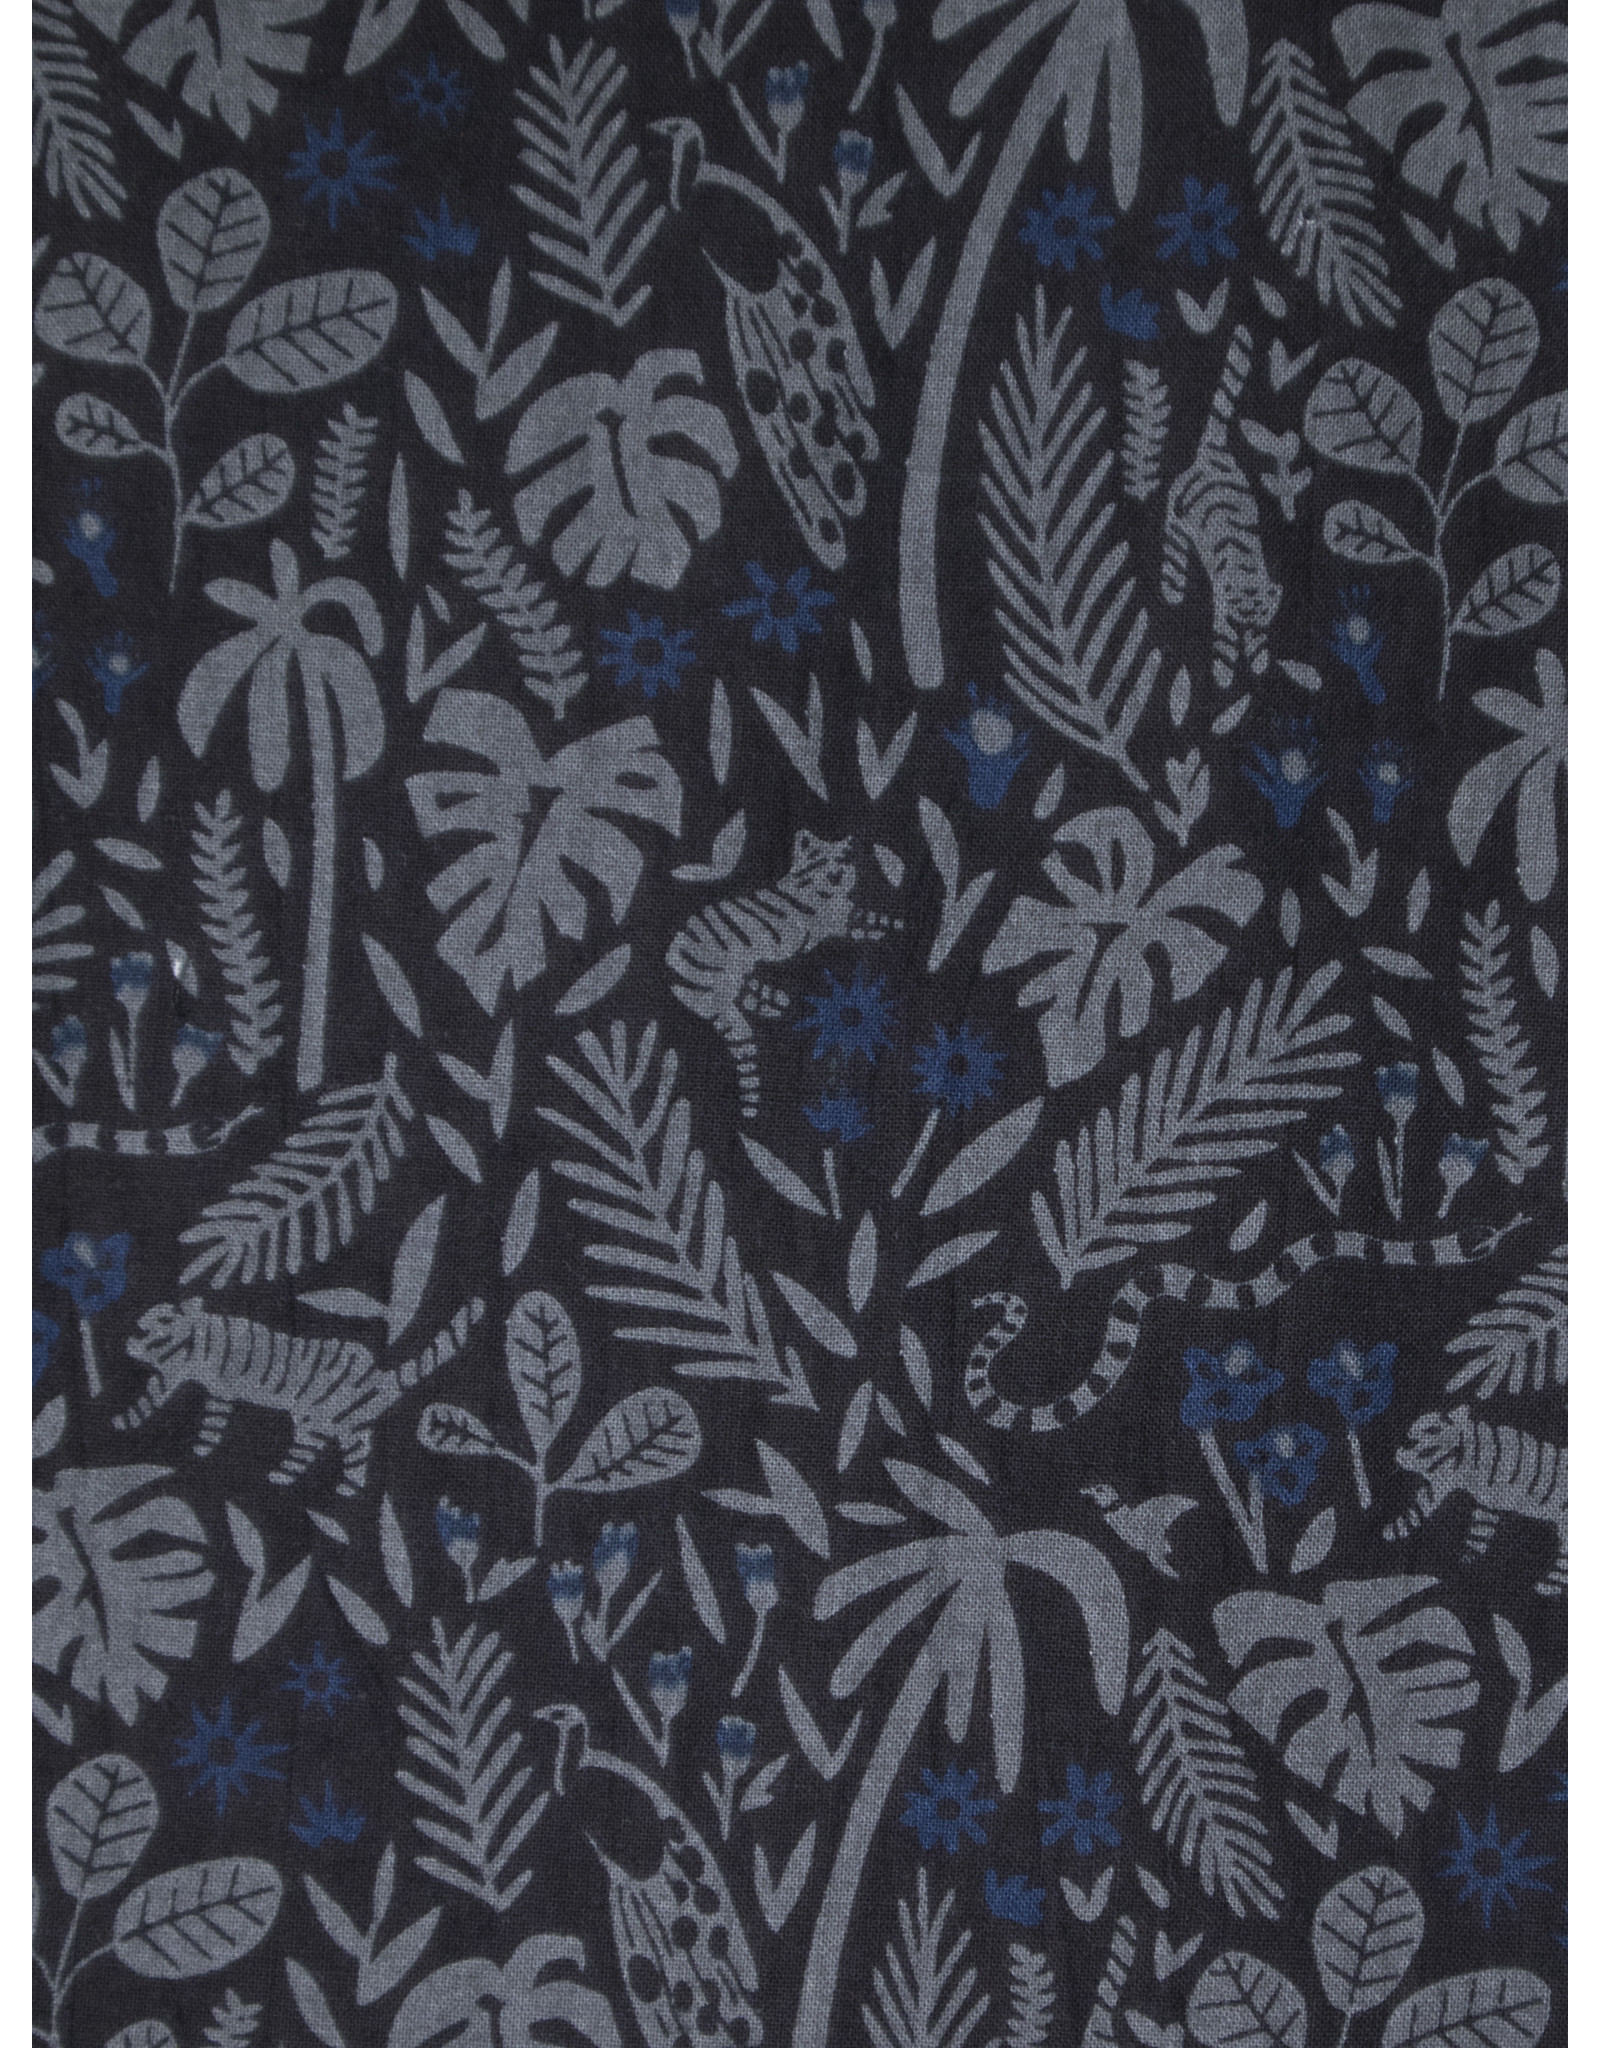 Marnie Dress in Midnight Jungle. India